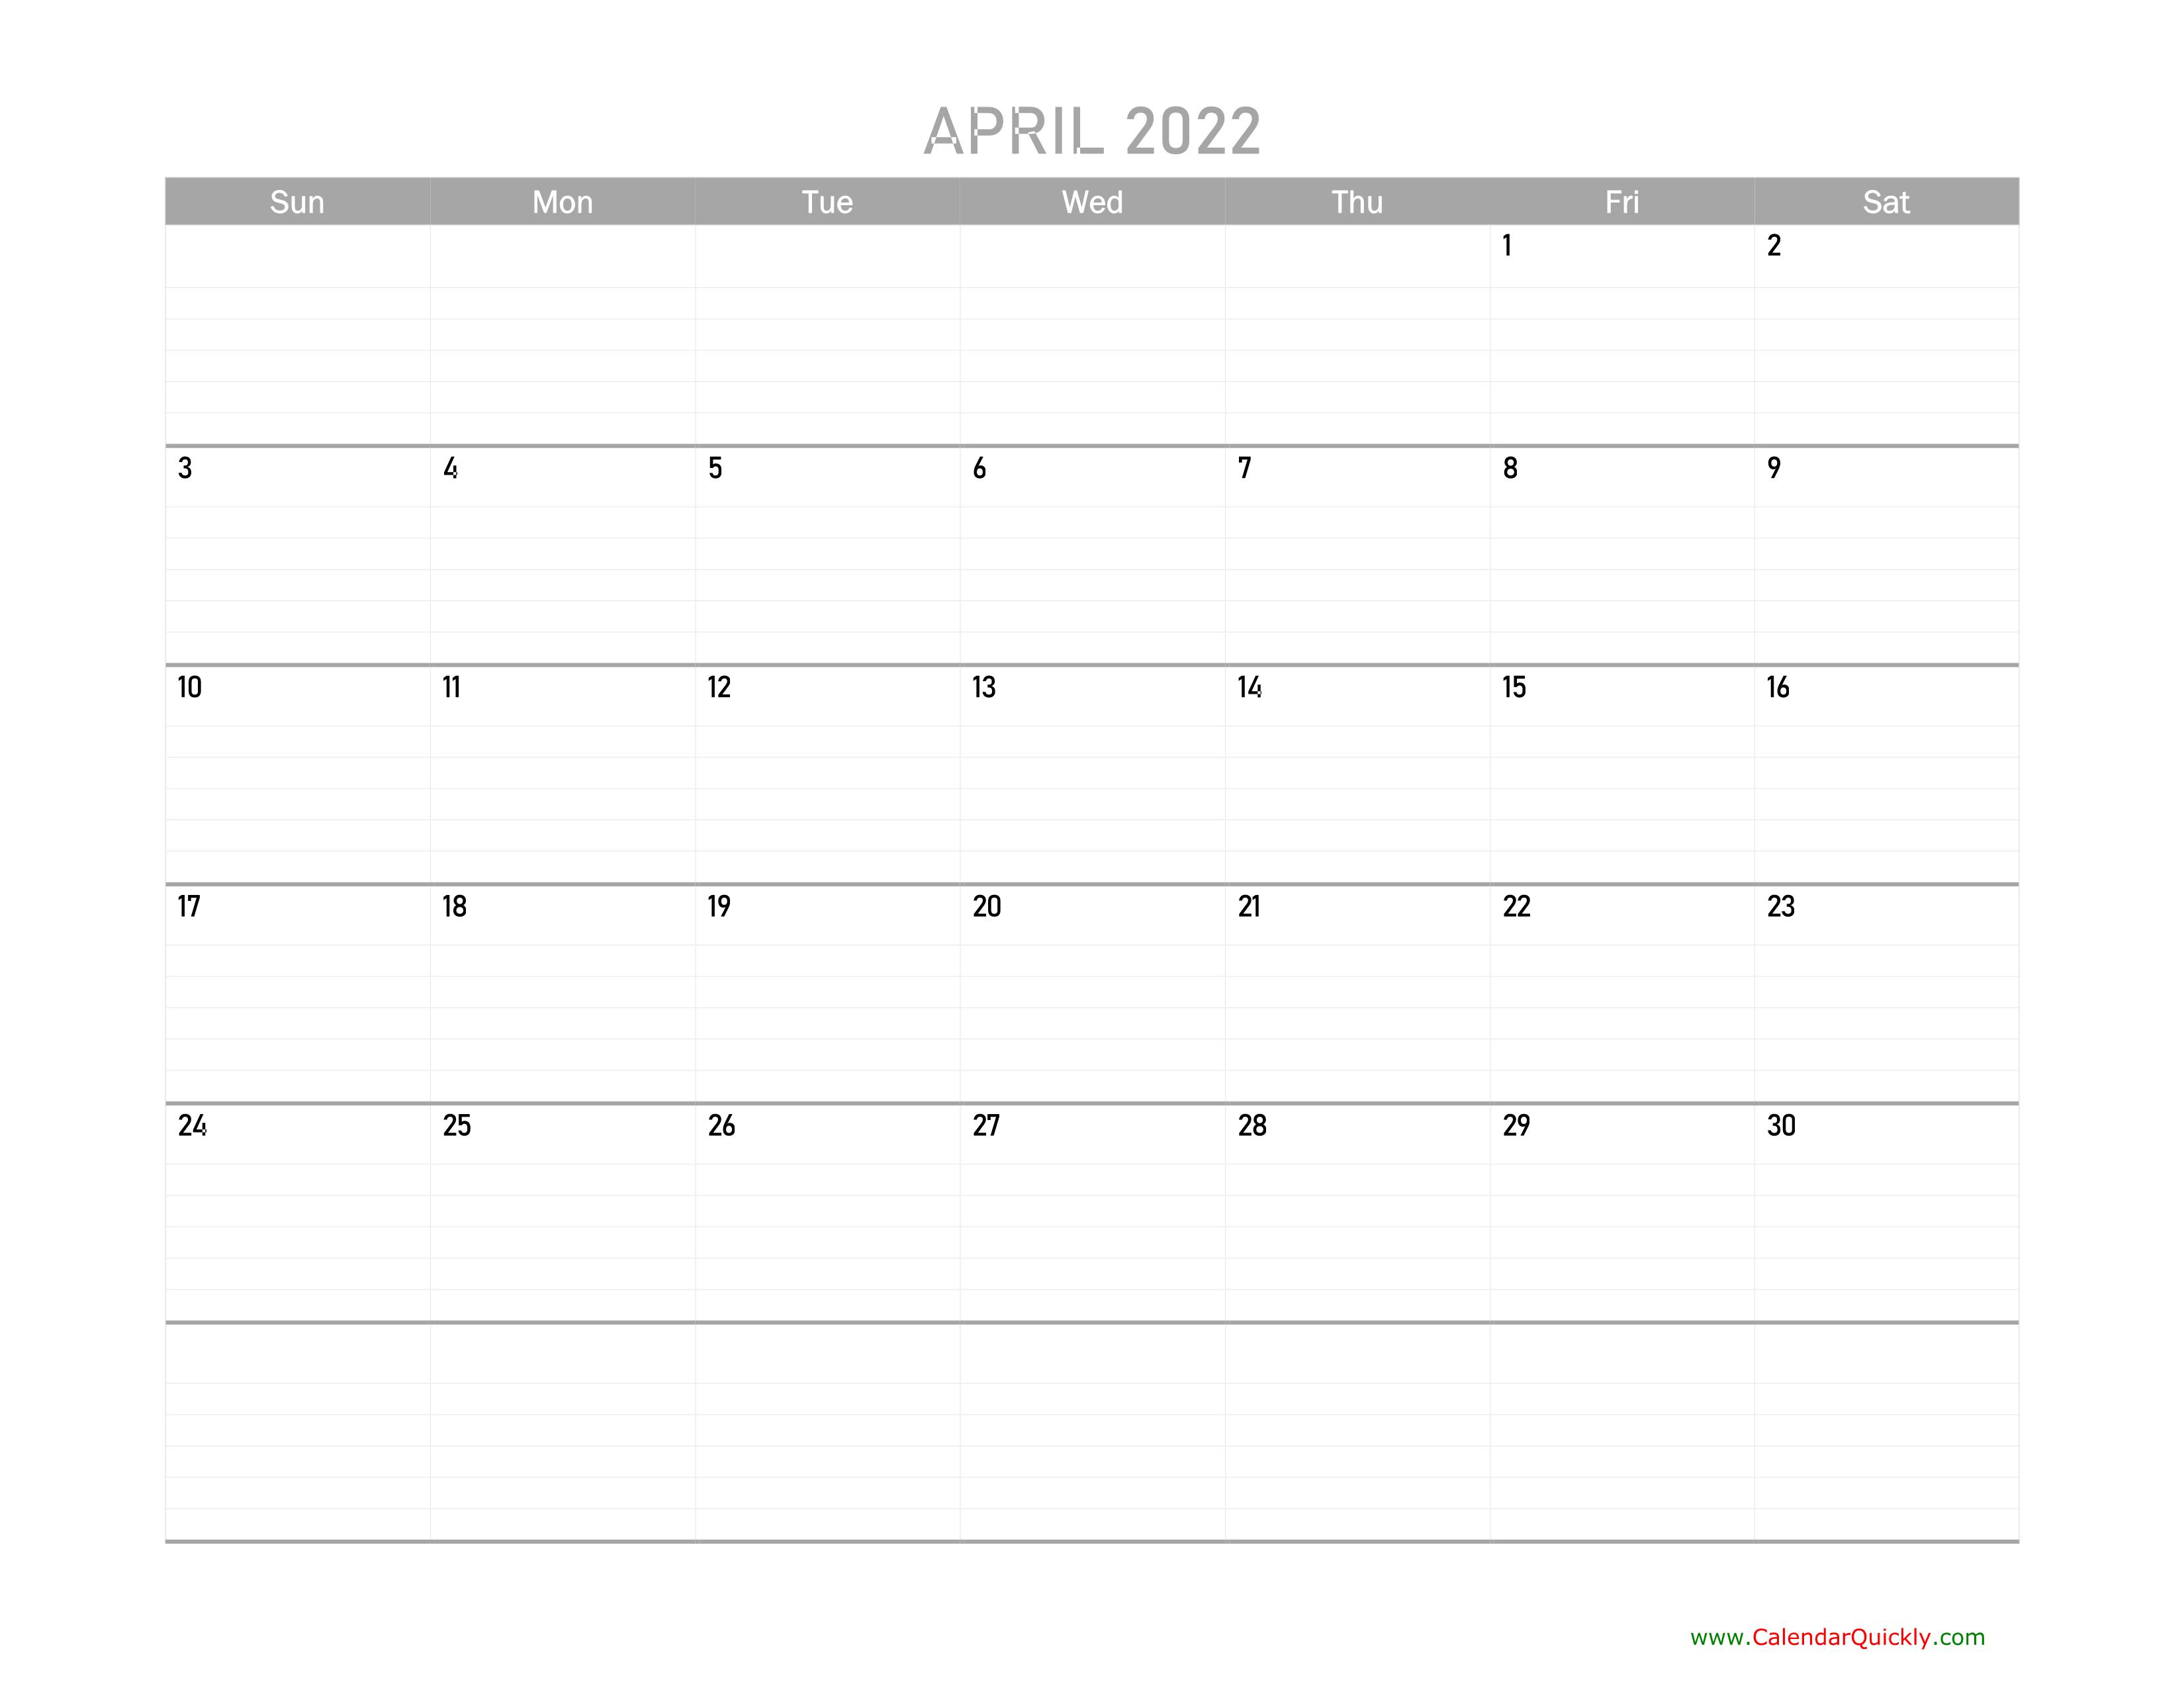 April Calendar 2022 Printable   Calendar Quickly